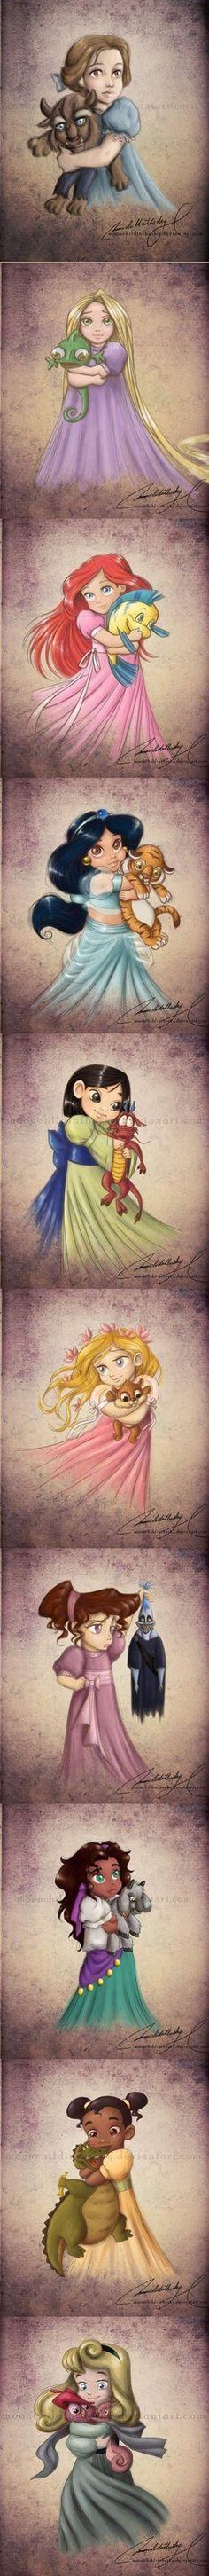 Baby Disney Princess Megara | Babies Disney Princesses and Ladies 1 - from DeviantArt. In line ...